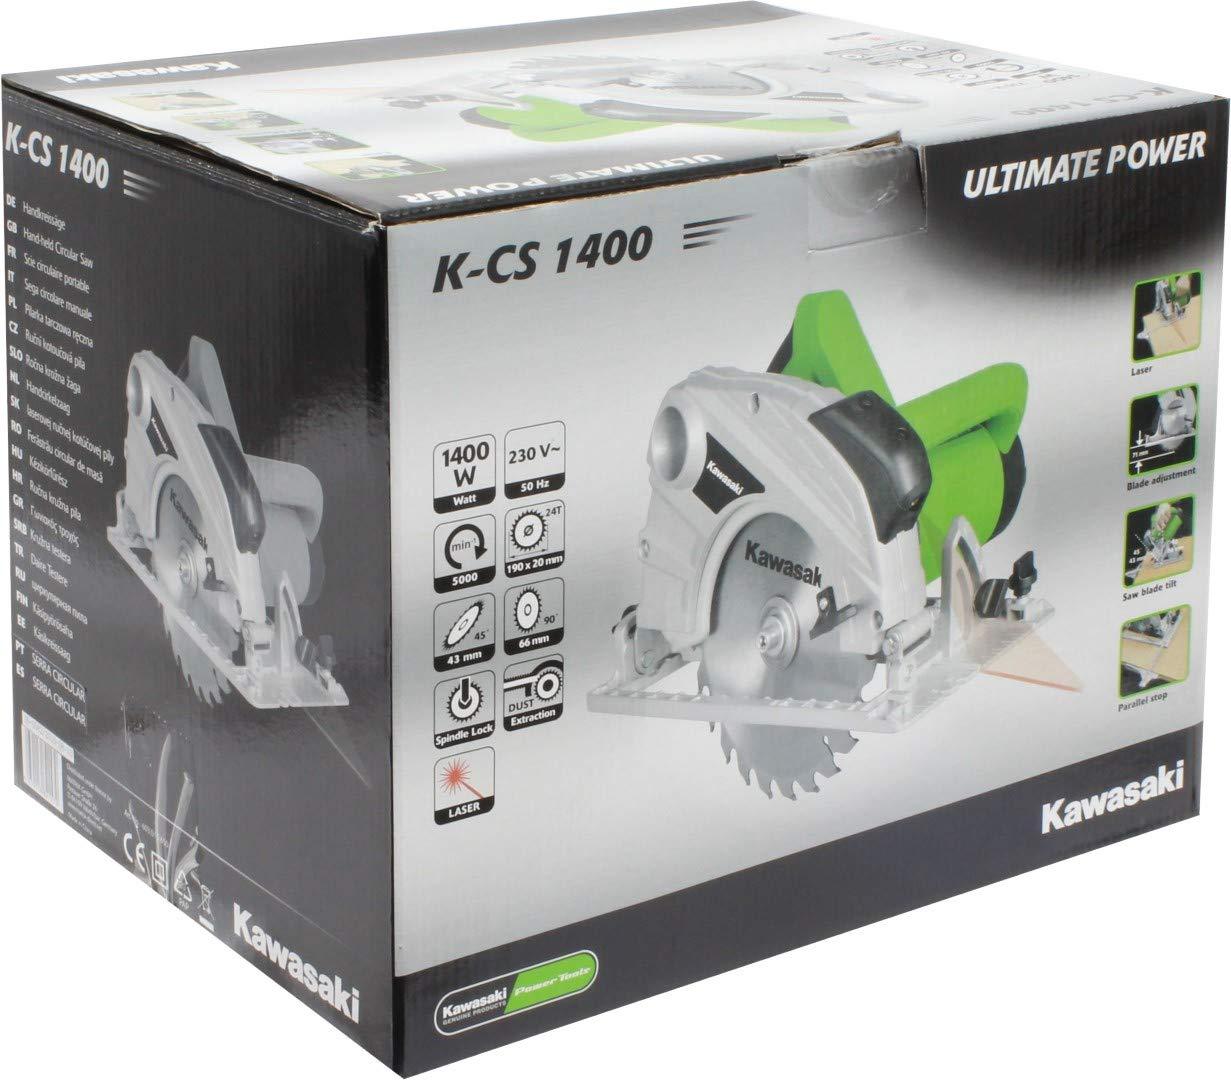 gr/ün Kawasaki 603010650 Handkreiss/äge K-CS 1400 schwarz